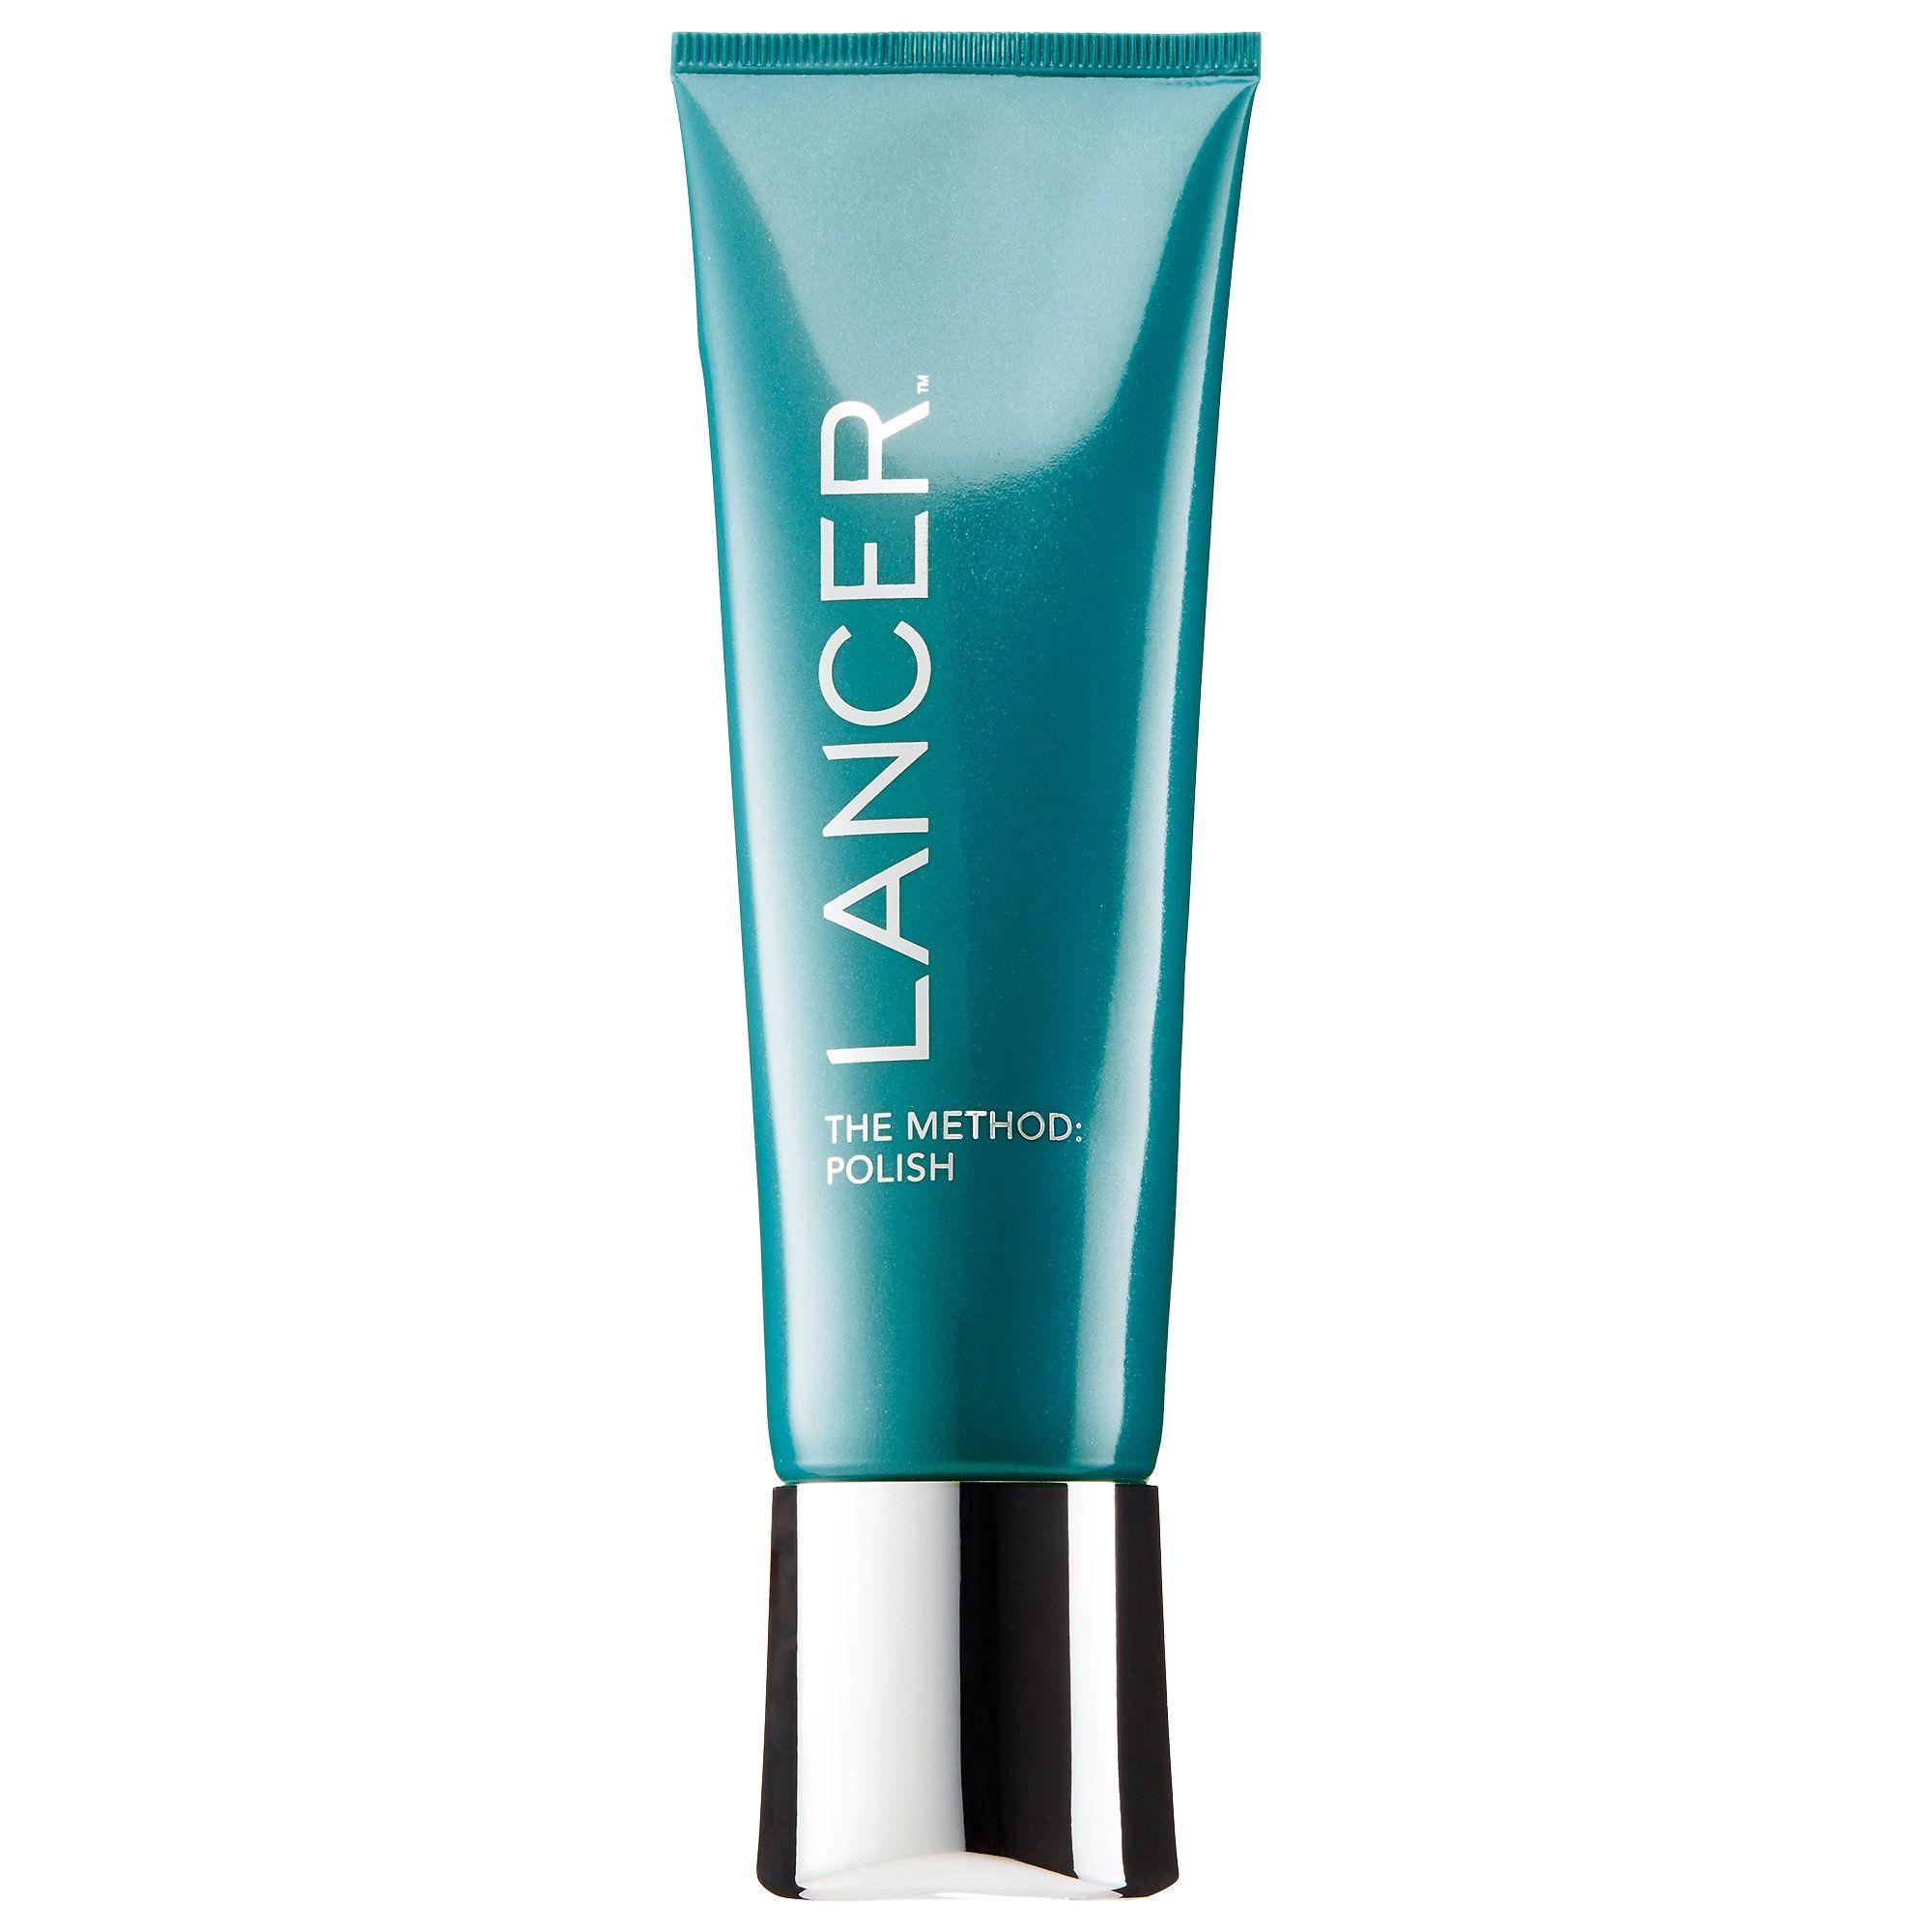 The Method Polish Normal Combination Skin Lancer Skincare Sephora Lancer Skincare Skin Care Treatments Skin Resurfacing Treatment